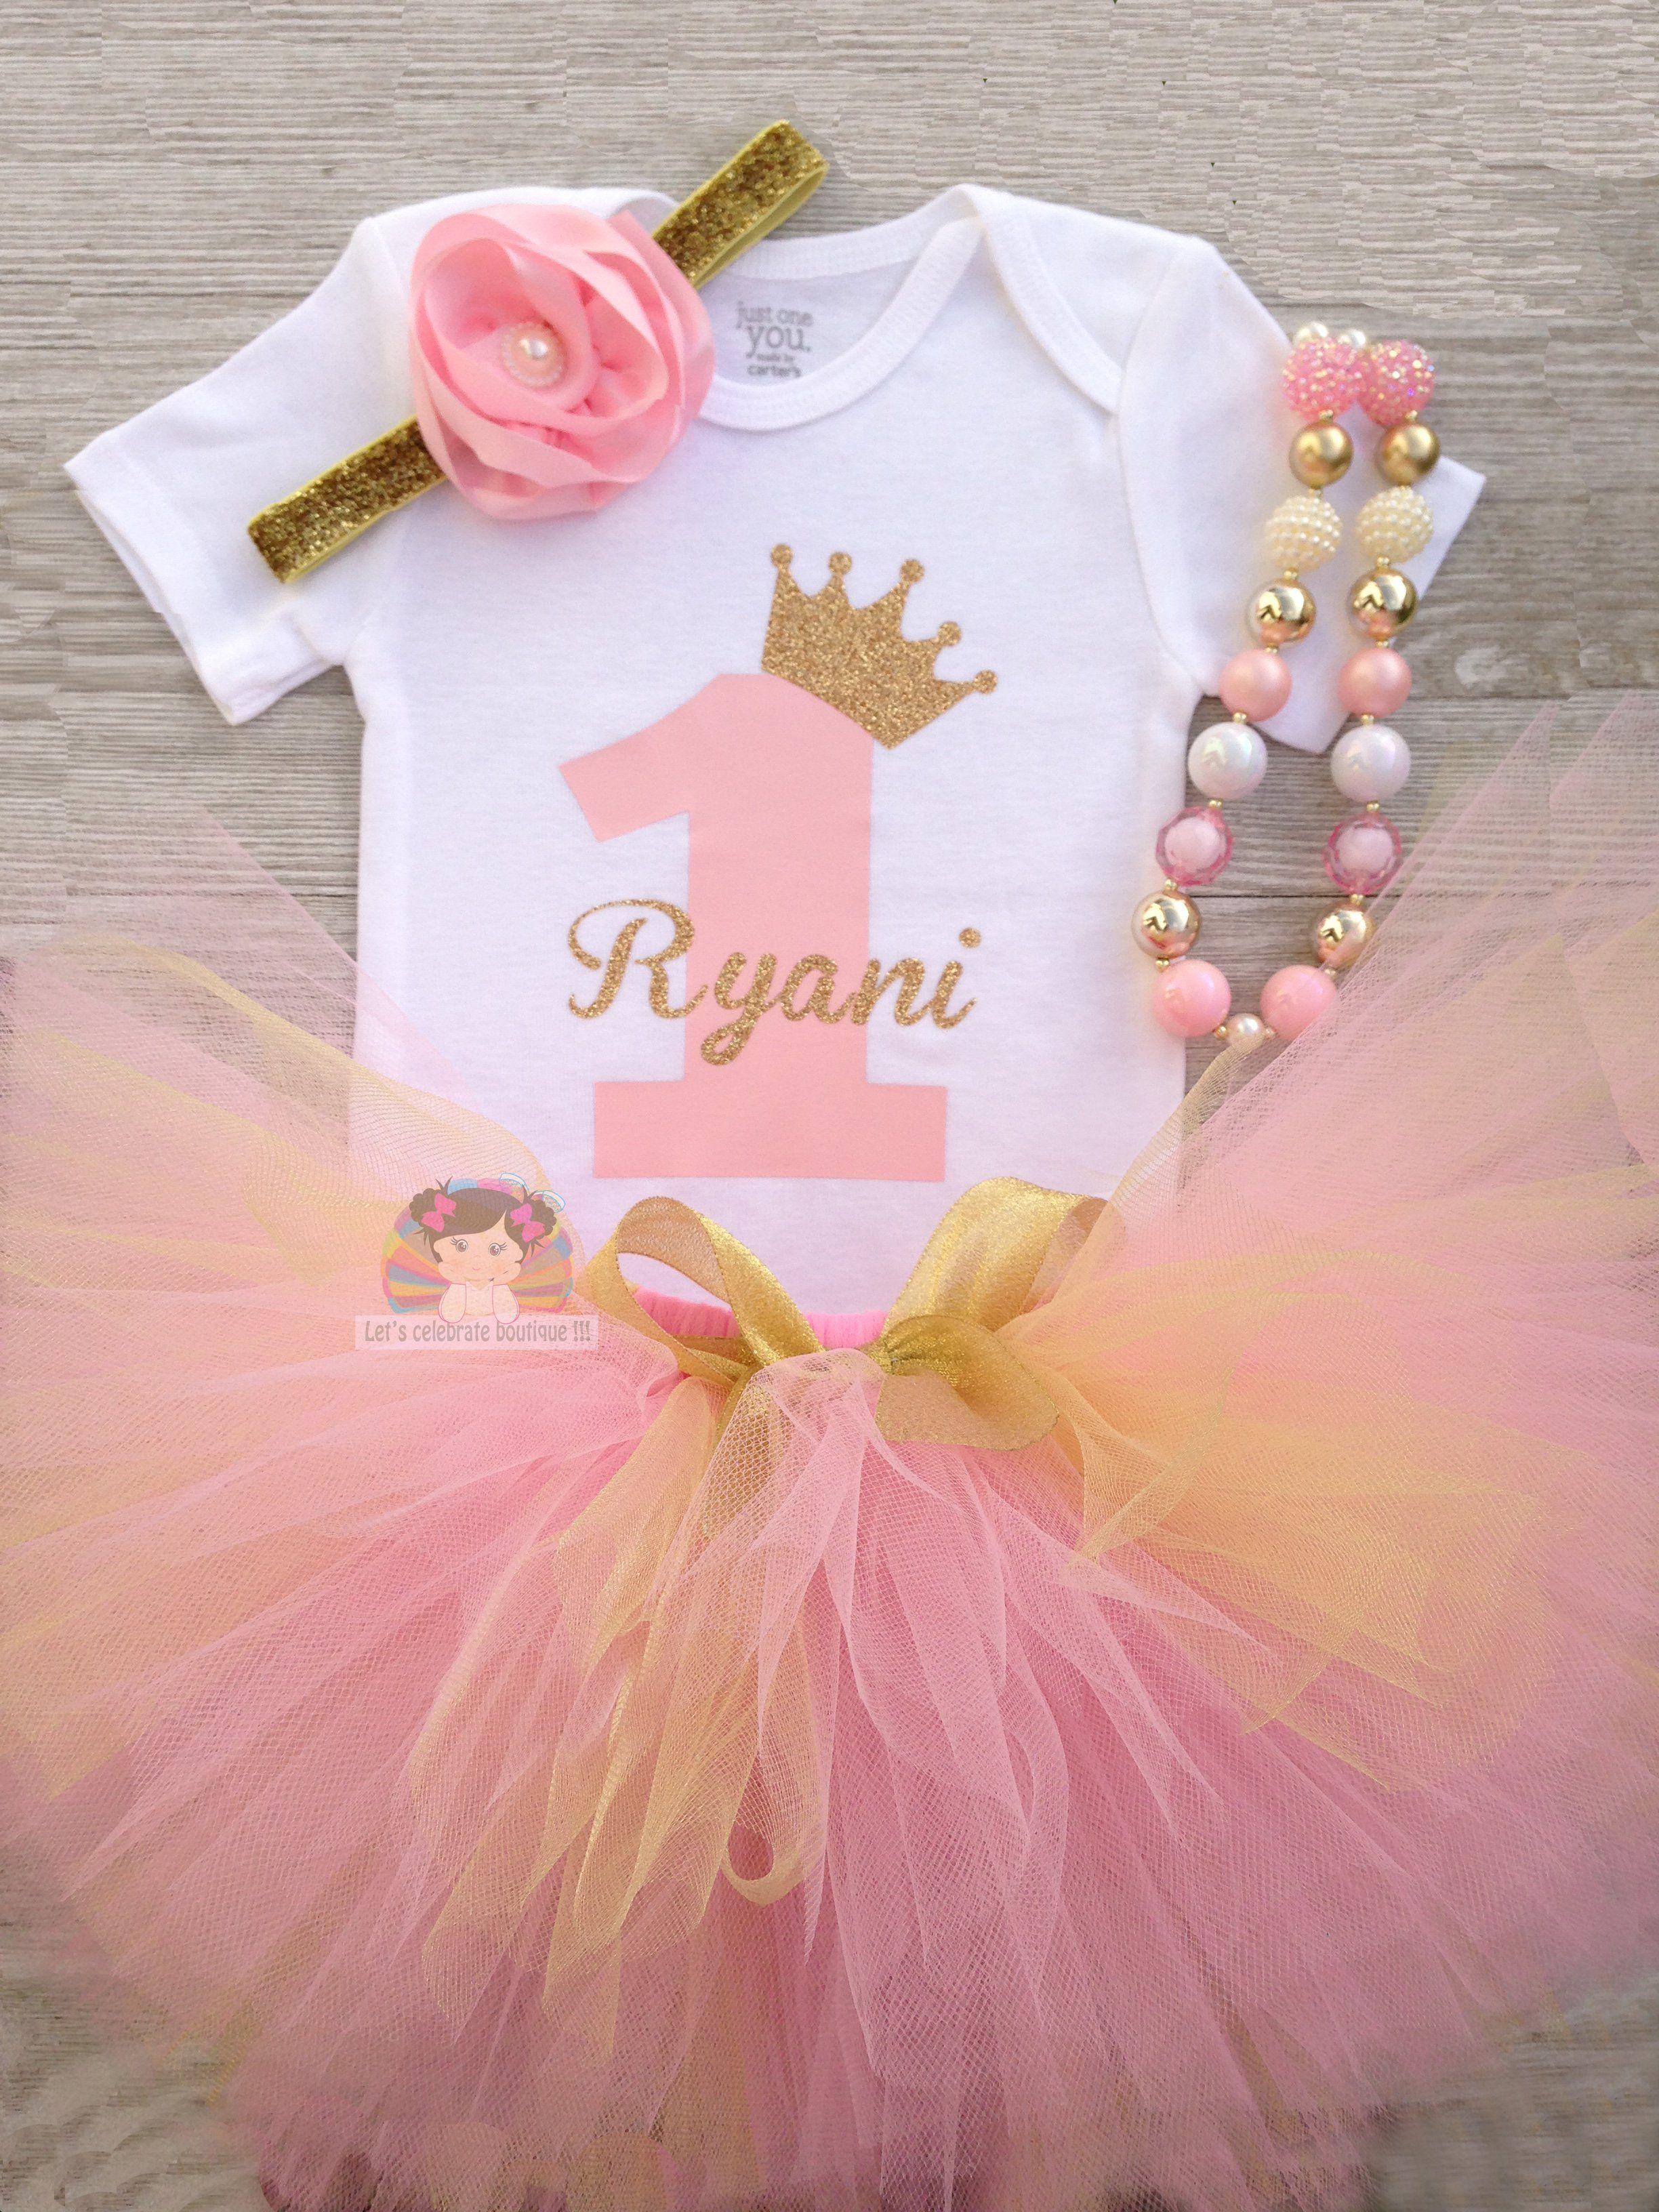 princess outfit pink and gold Princess Birthday tutu set cake smash Princess Party outfit First Birthday tutu set